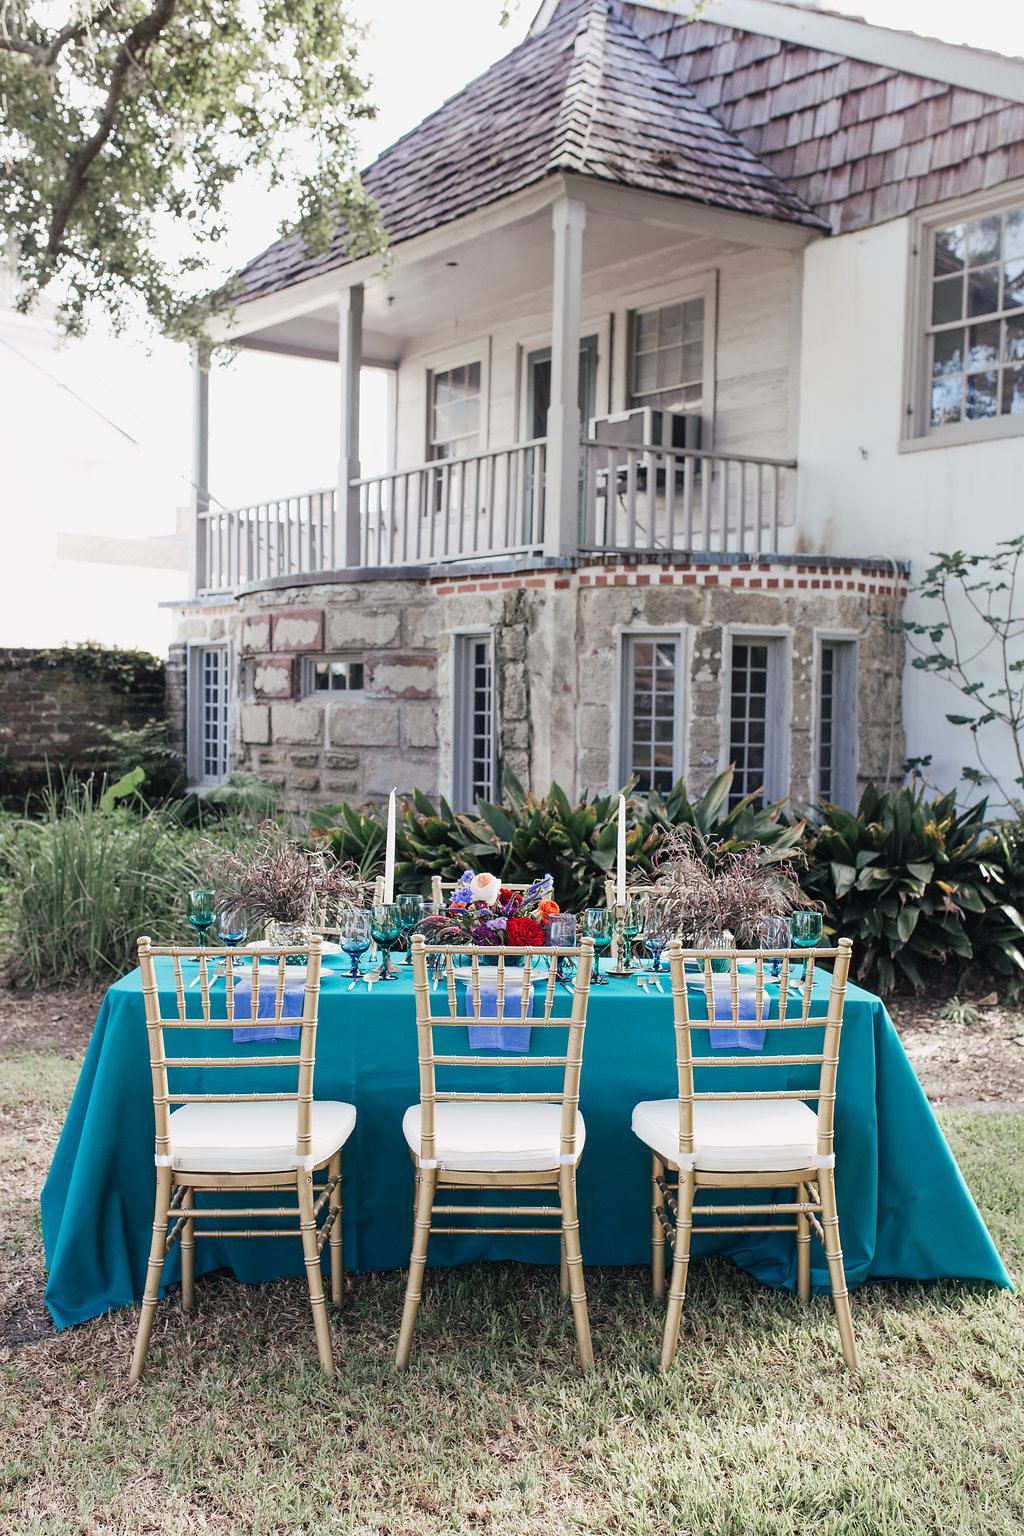 romantic southern wedding inspiration - photo by Alondra Vega Photography http://ruffledblog.com/jewel-toned-wedding-ideas-with-a-surprise-proposal